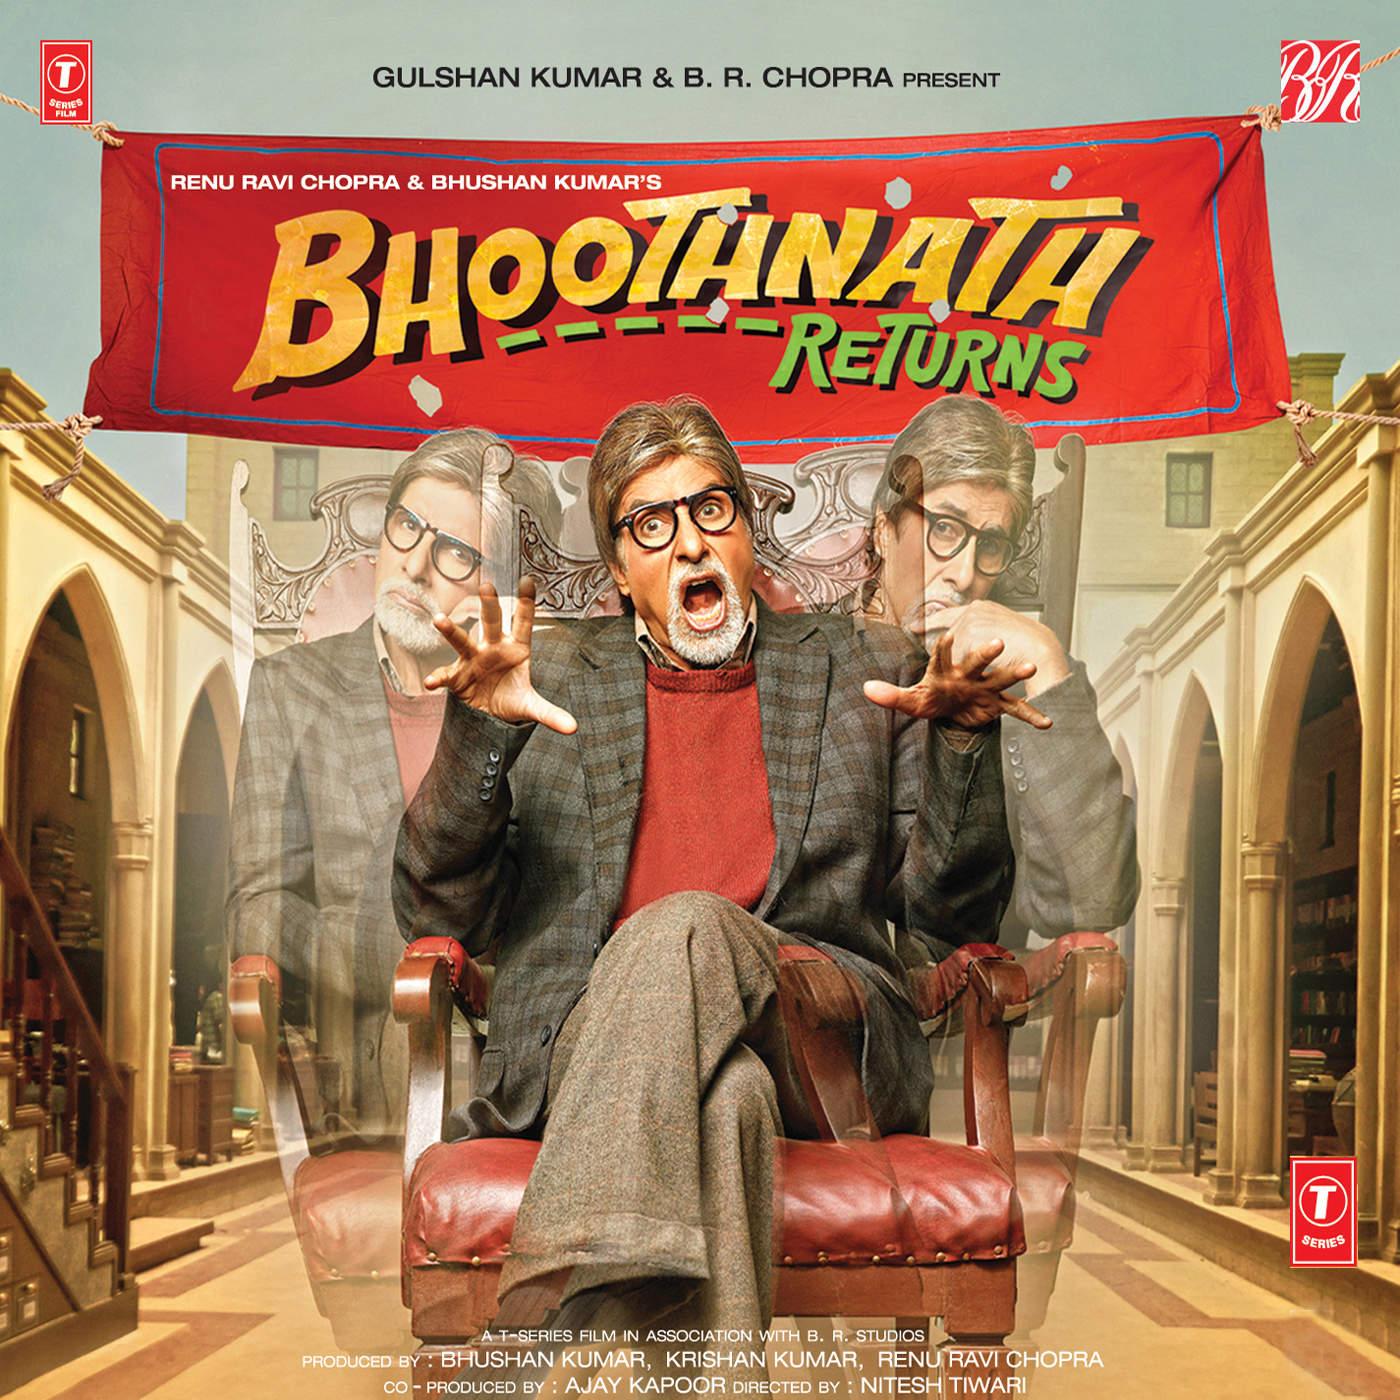 Meet Bros Anjjan, Ram Sampath, Yo Yo Honey Singh & Palash Mucchal - Bhoothnath Returns (Original Motion Picture Soundtrack)